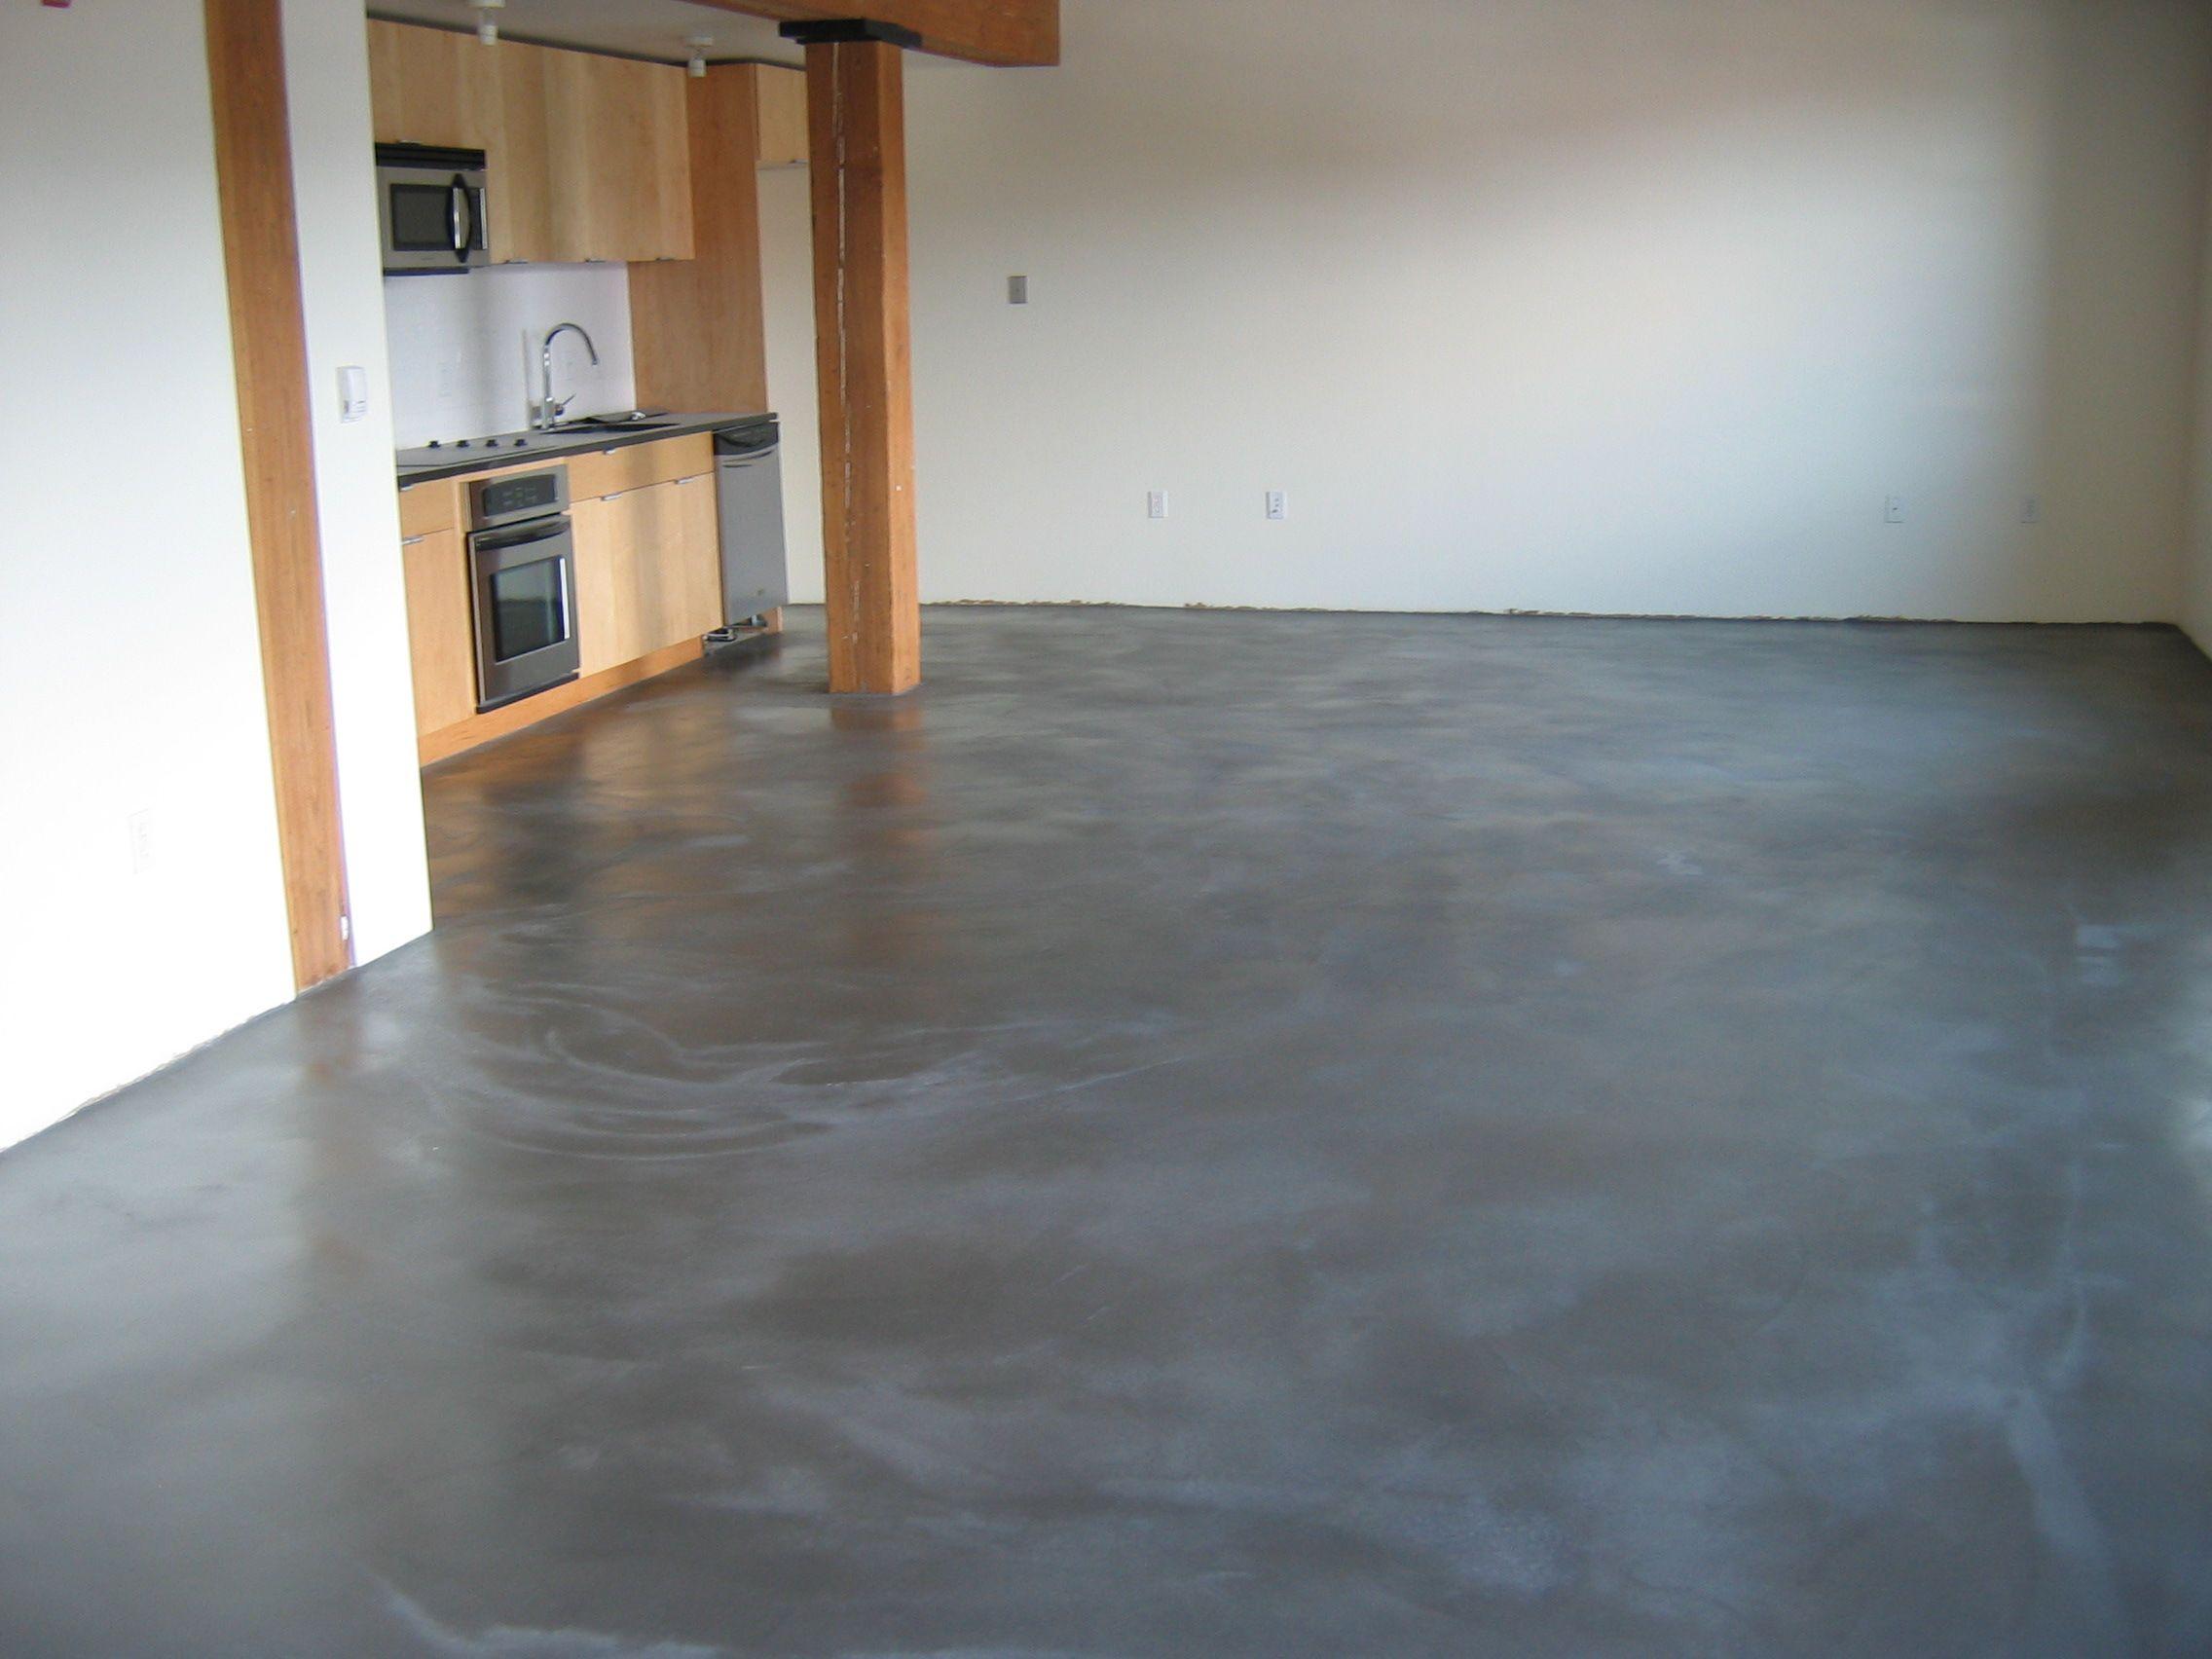 concrete floor kitchen poured concrete floors Concrete Polishing Concrete Floor Experts Save the Day in Boston